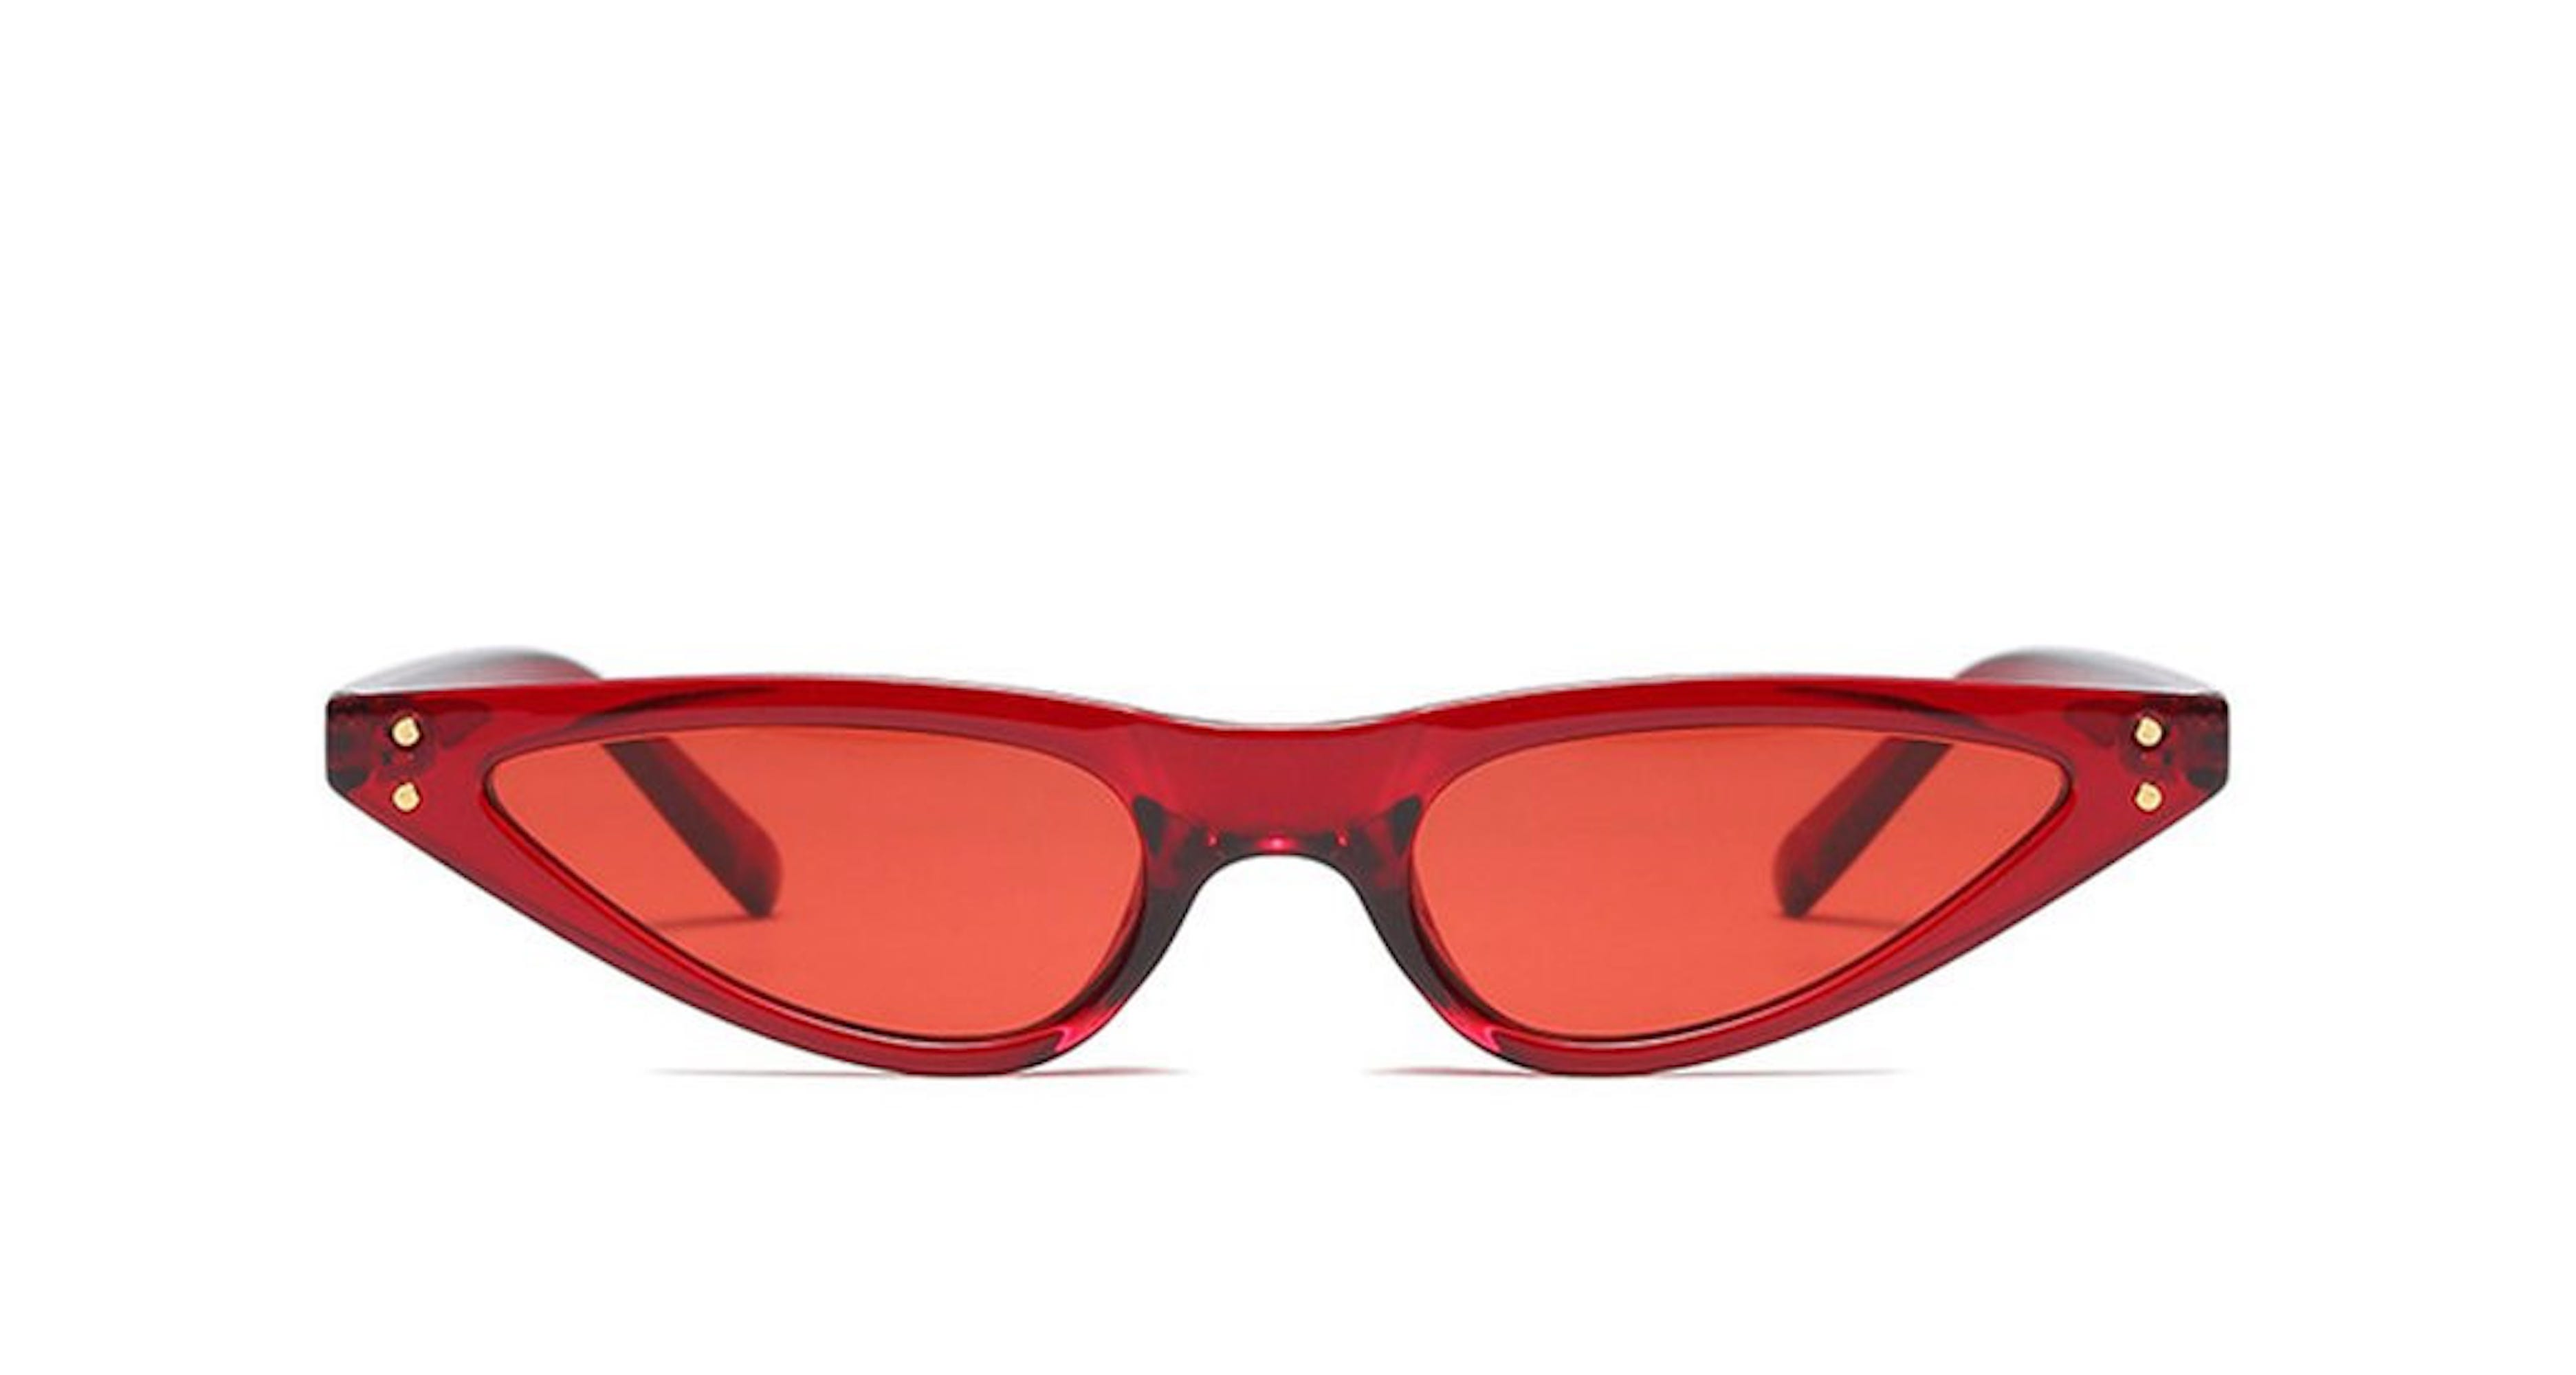 e3583d3b955 Matrix Sunglasses - Where To Buy Skinny Shades